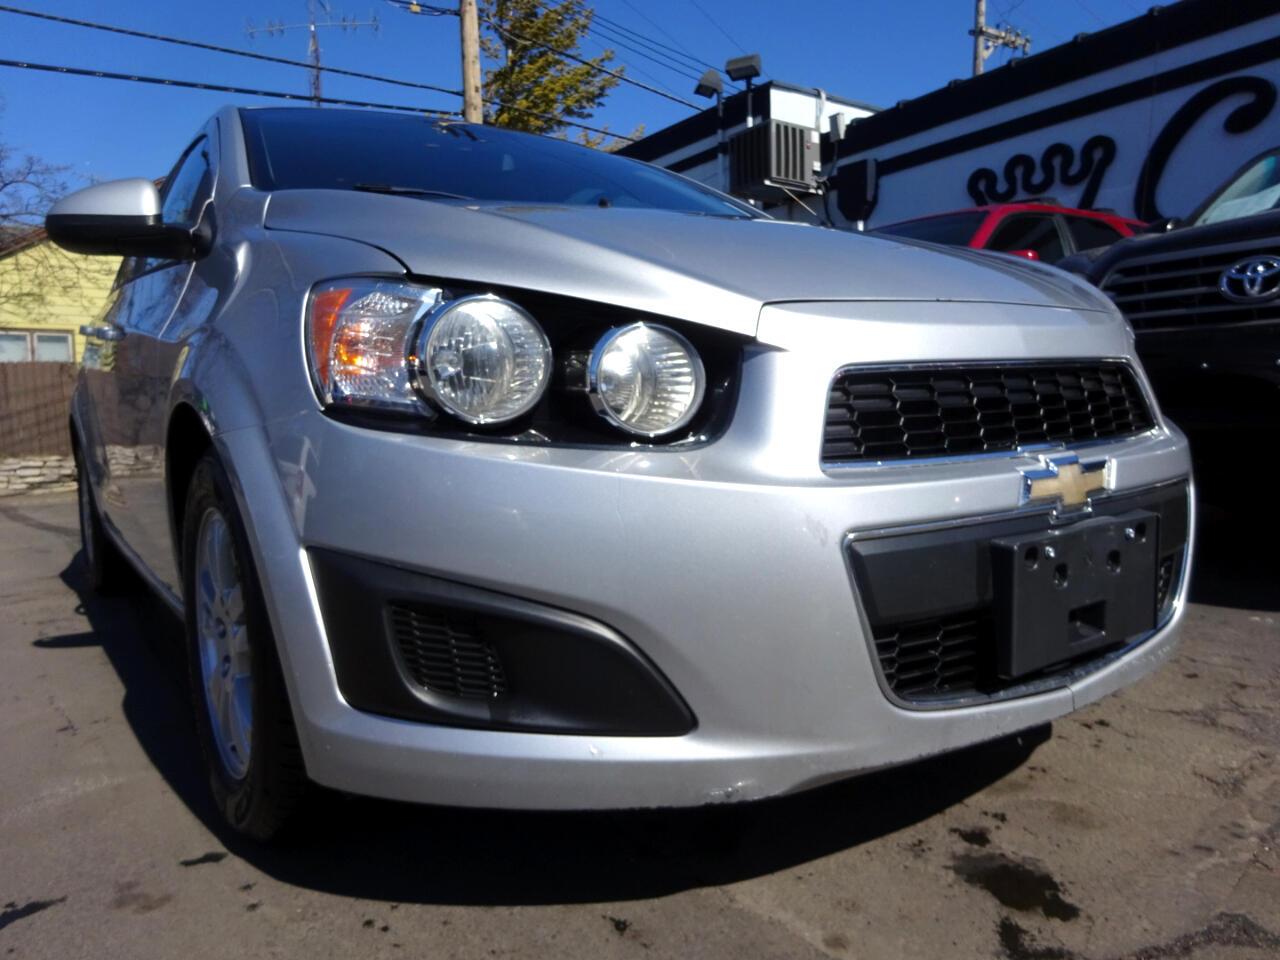 Chevrolet Sonic 4dr Sdn LS 2LS 2012